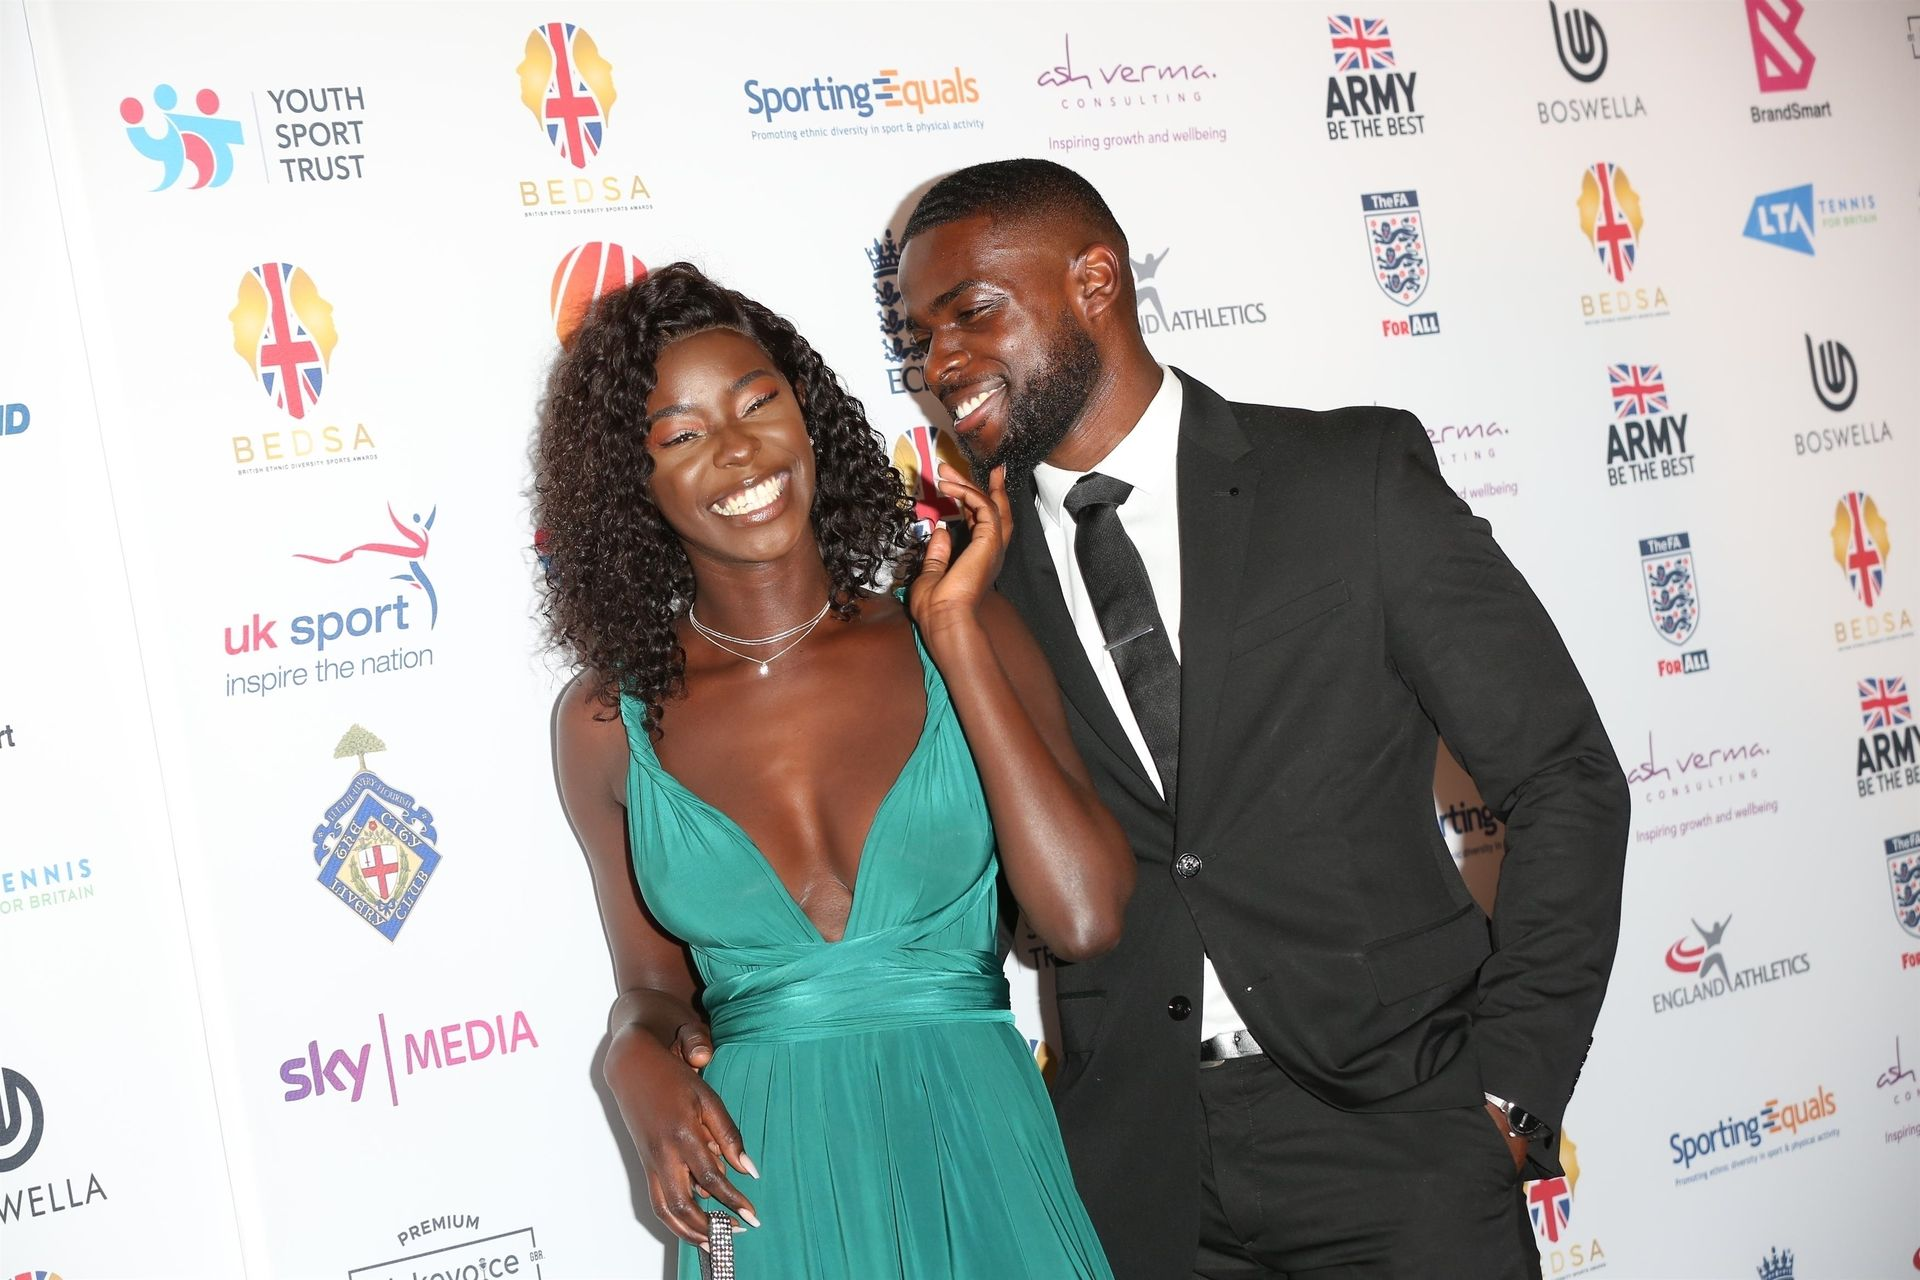 Mike Boateng & Priscilla Anyabu Are Seen At British Ethnic Diversity Sports Awards 0074